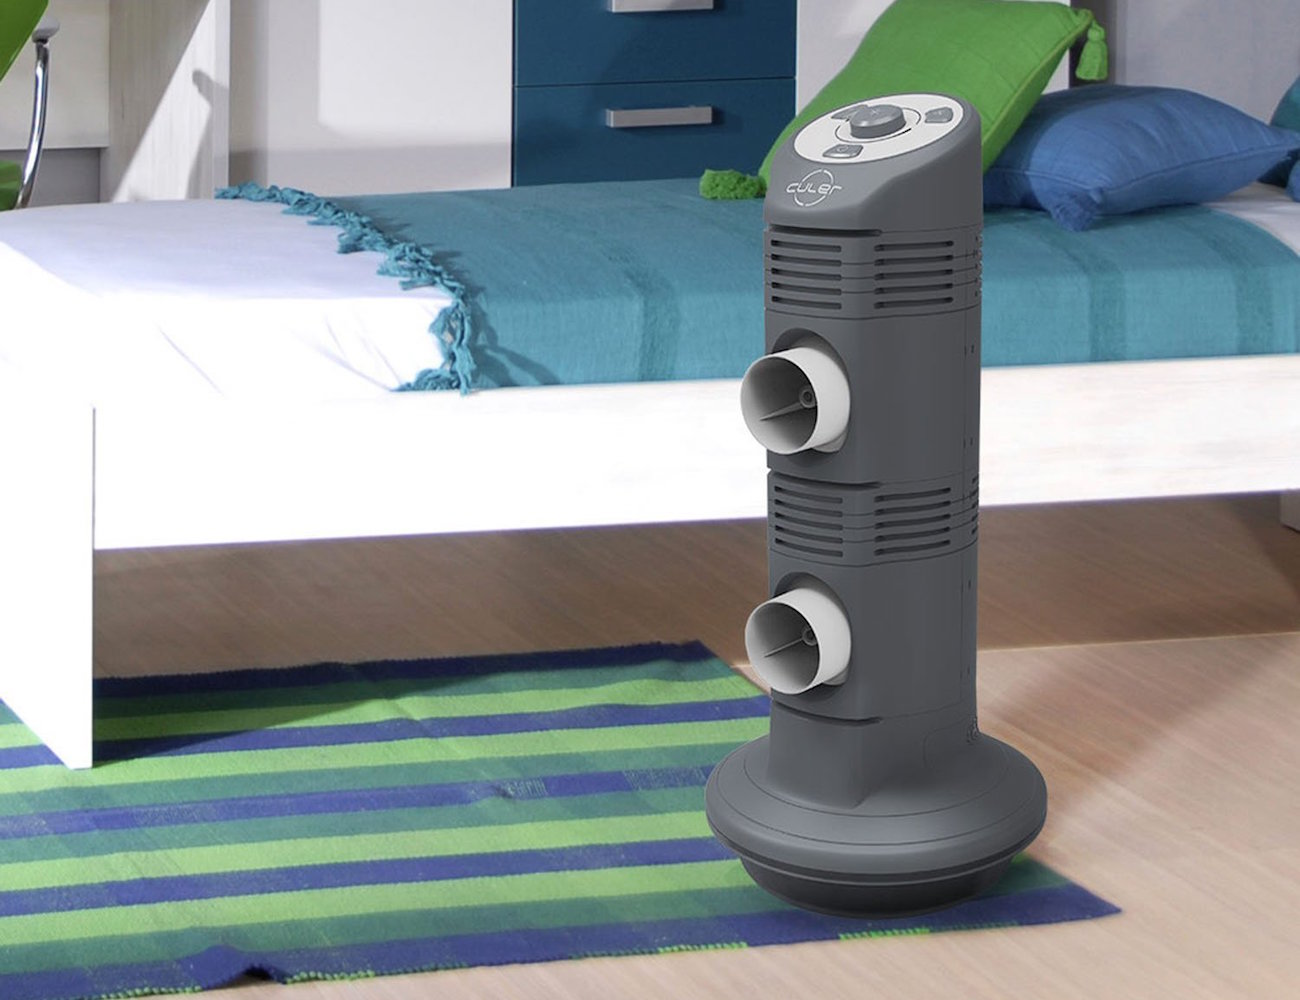 Culer 3-Speed Double Port Space Cooler